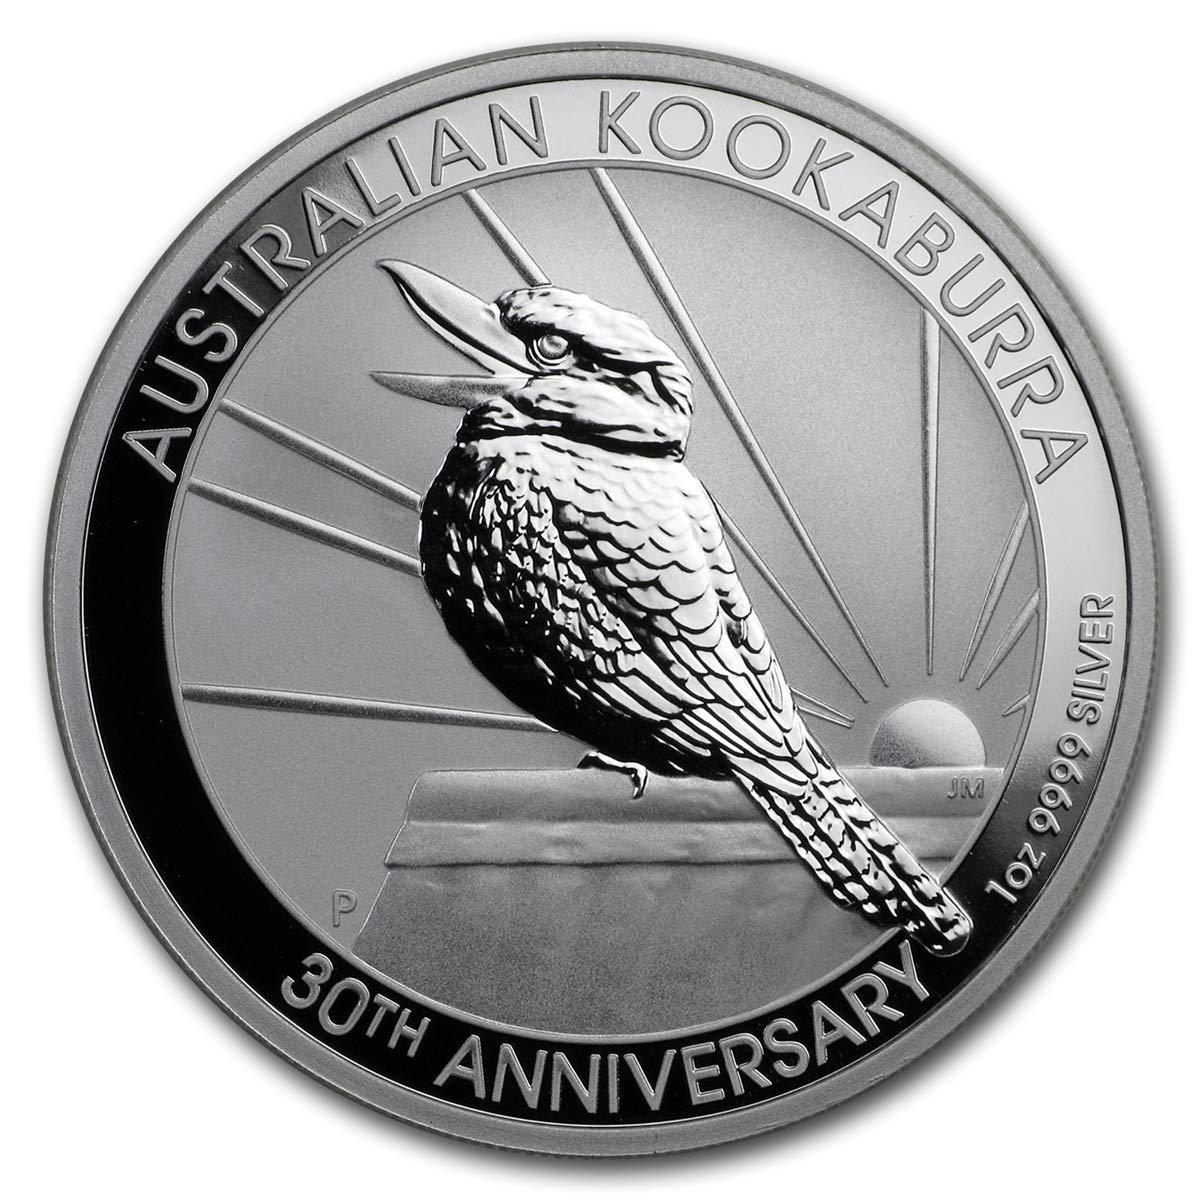 B081D9LM7S 2020 AU 30th Anniversary Australian Kookaburra Silver Coin Dollar Uncircualted Mint 71LeAo9Fa4L